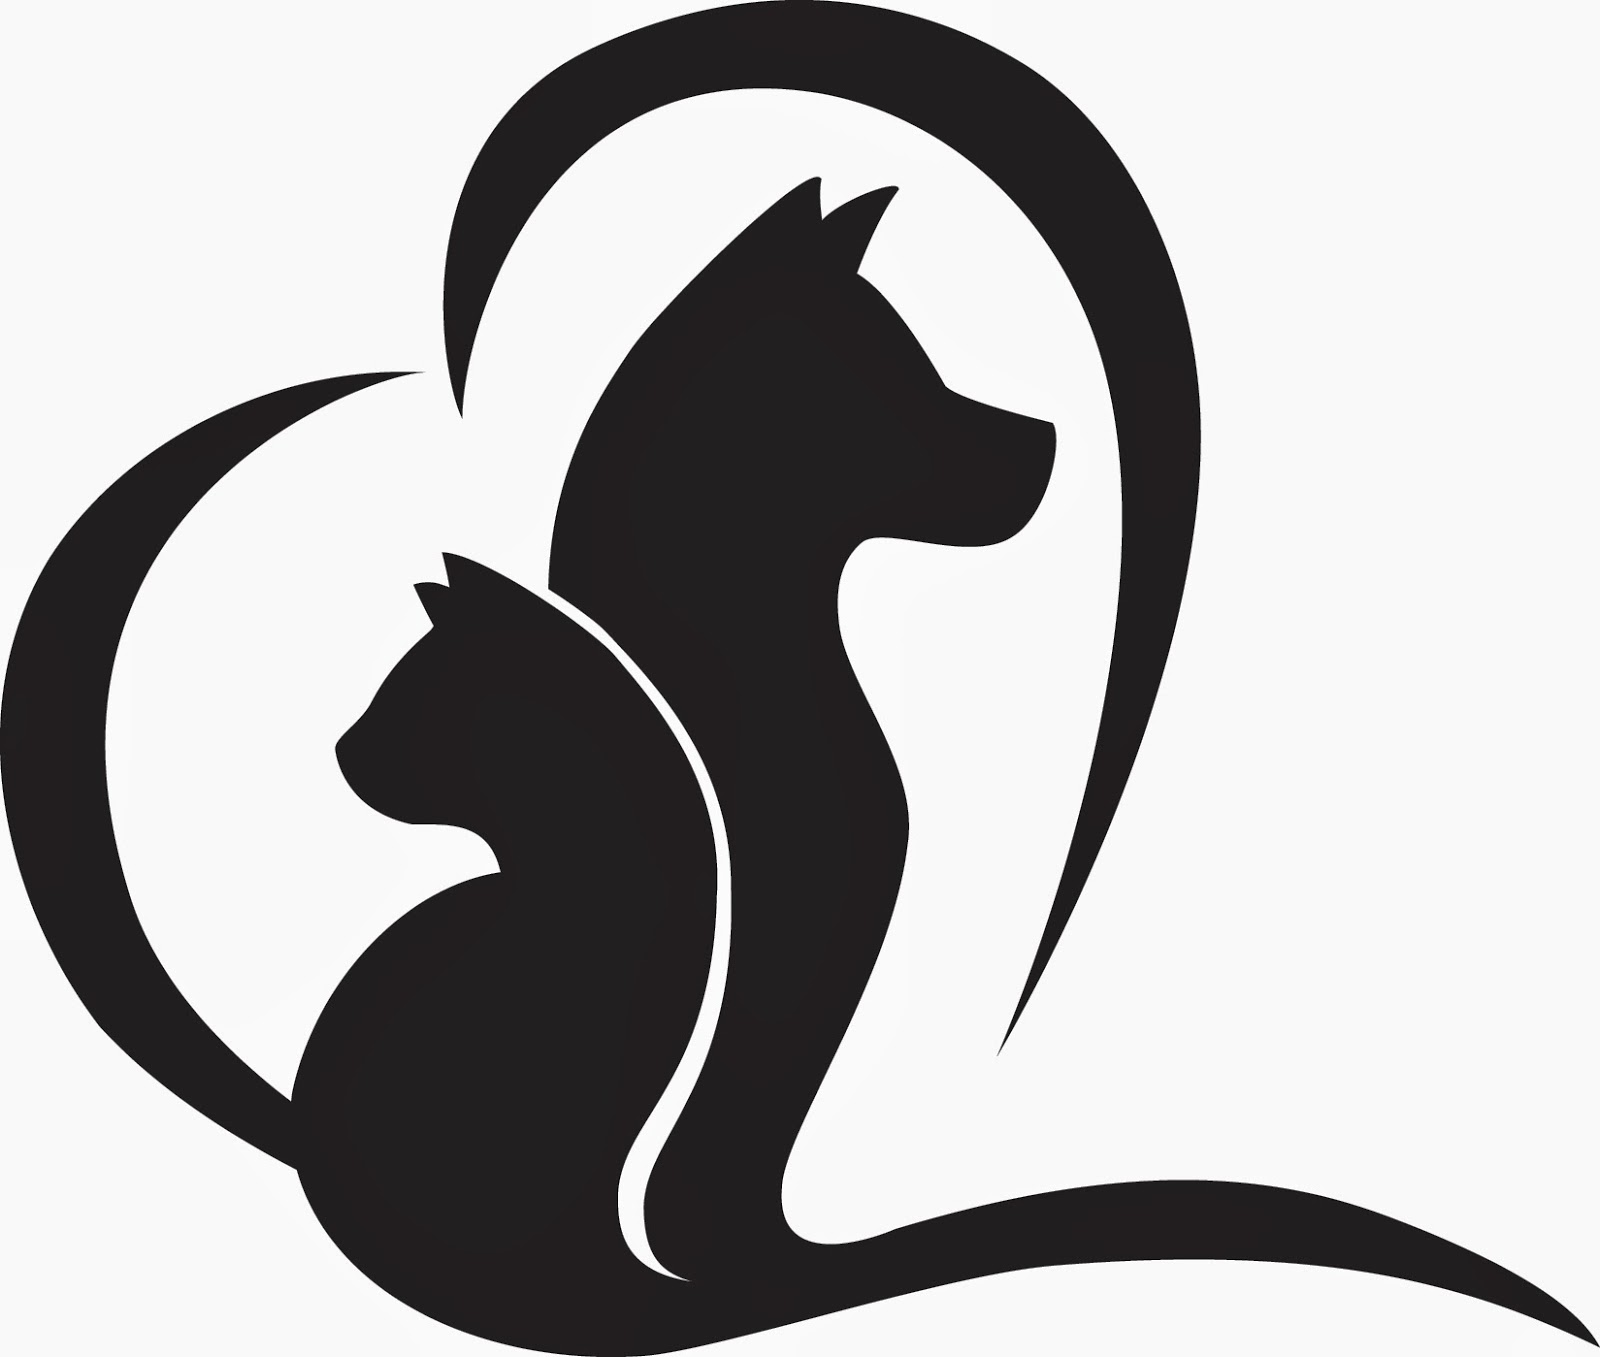 Cat logo clipart clip art black and white download Dog And Cat Clipart Black And White | Free download best Dog And Cat ... clip art black and white download